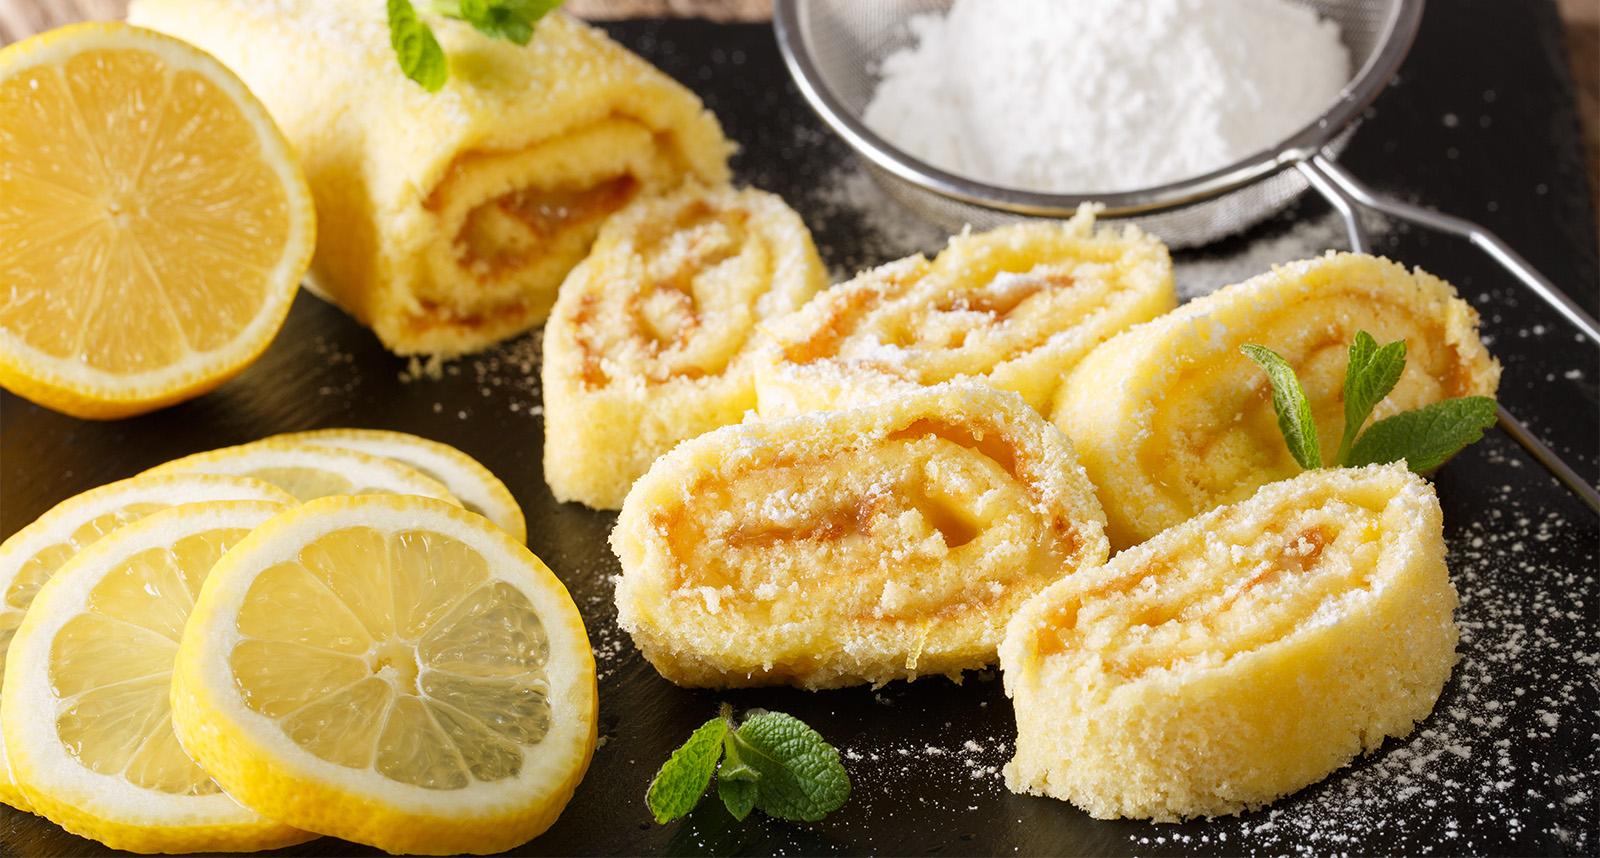 Rotolo al limone senza panna e latte